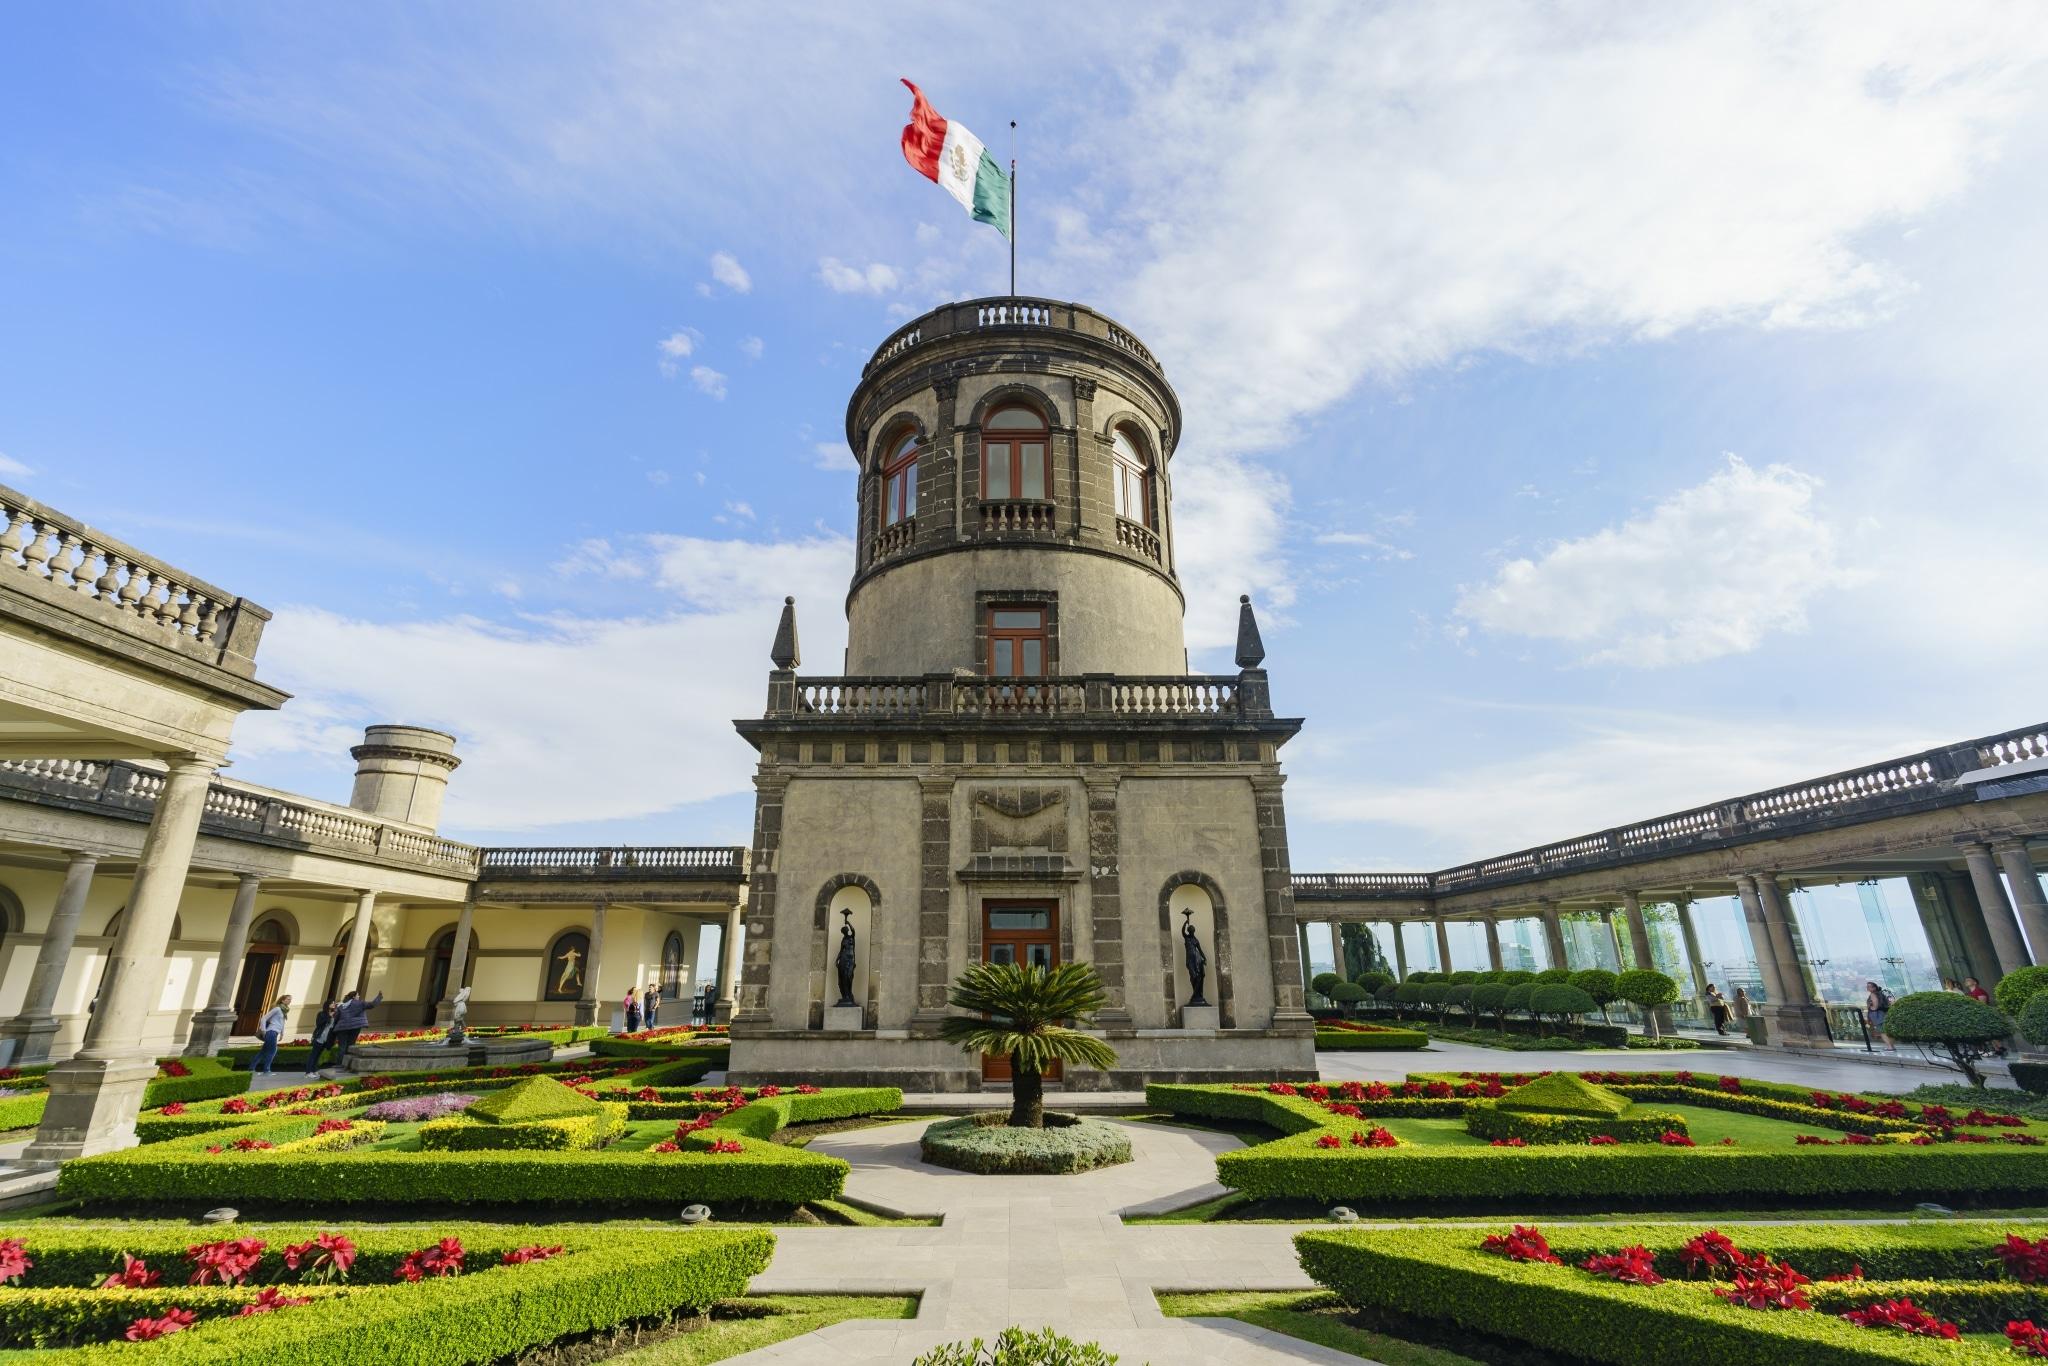 Caballero Alto - torreón del Castillo de Chapultepec